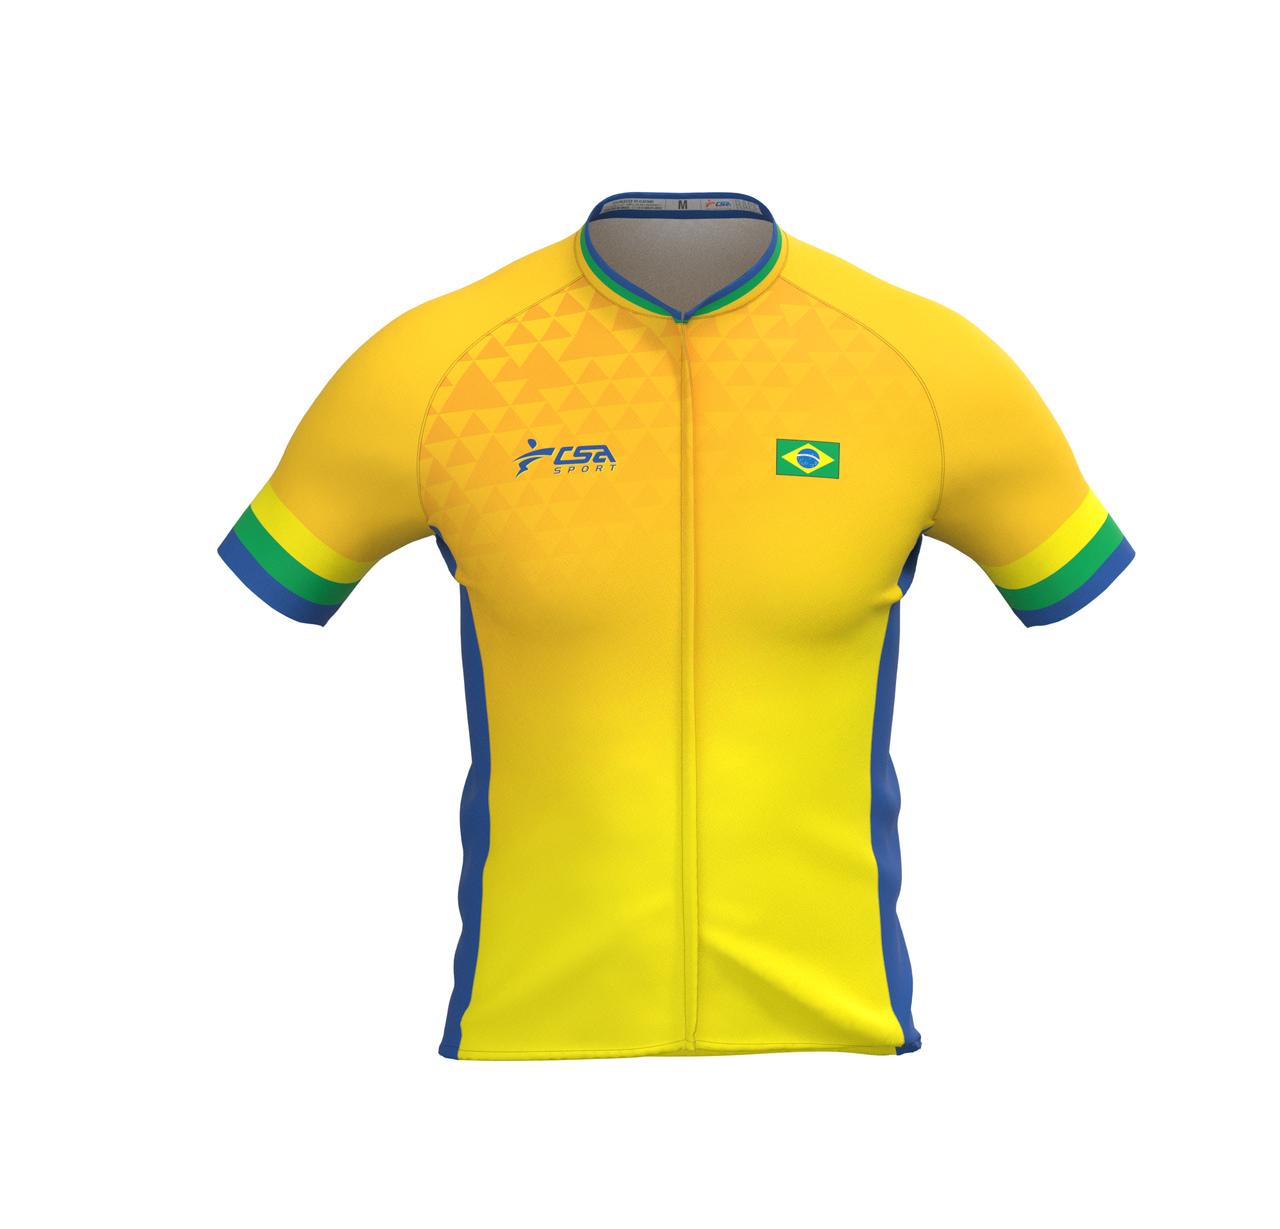 Camisa Ciclista Fast CSA Sport Masculina Brasil Gold